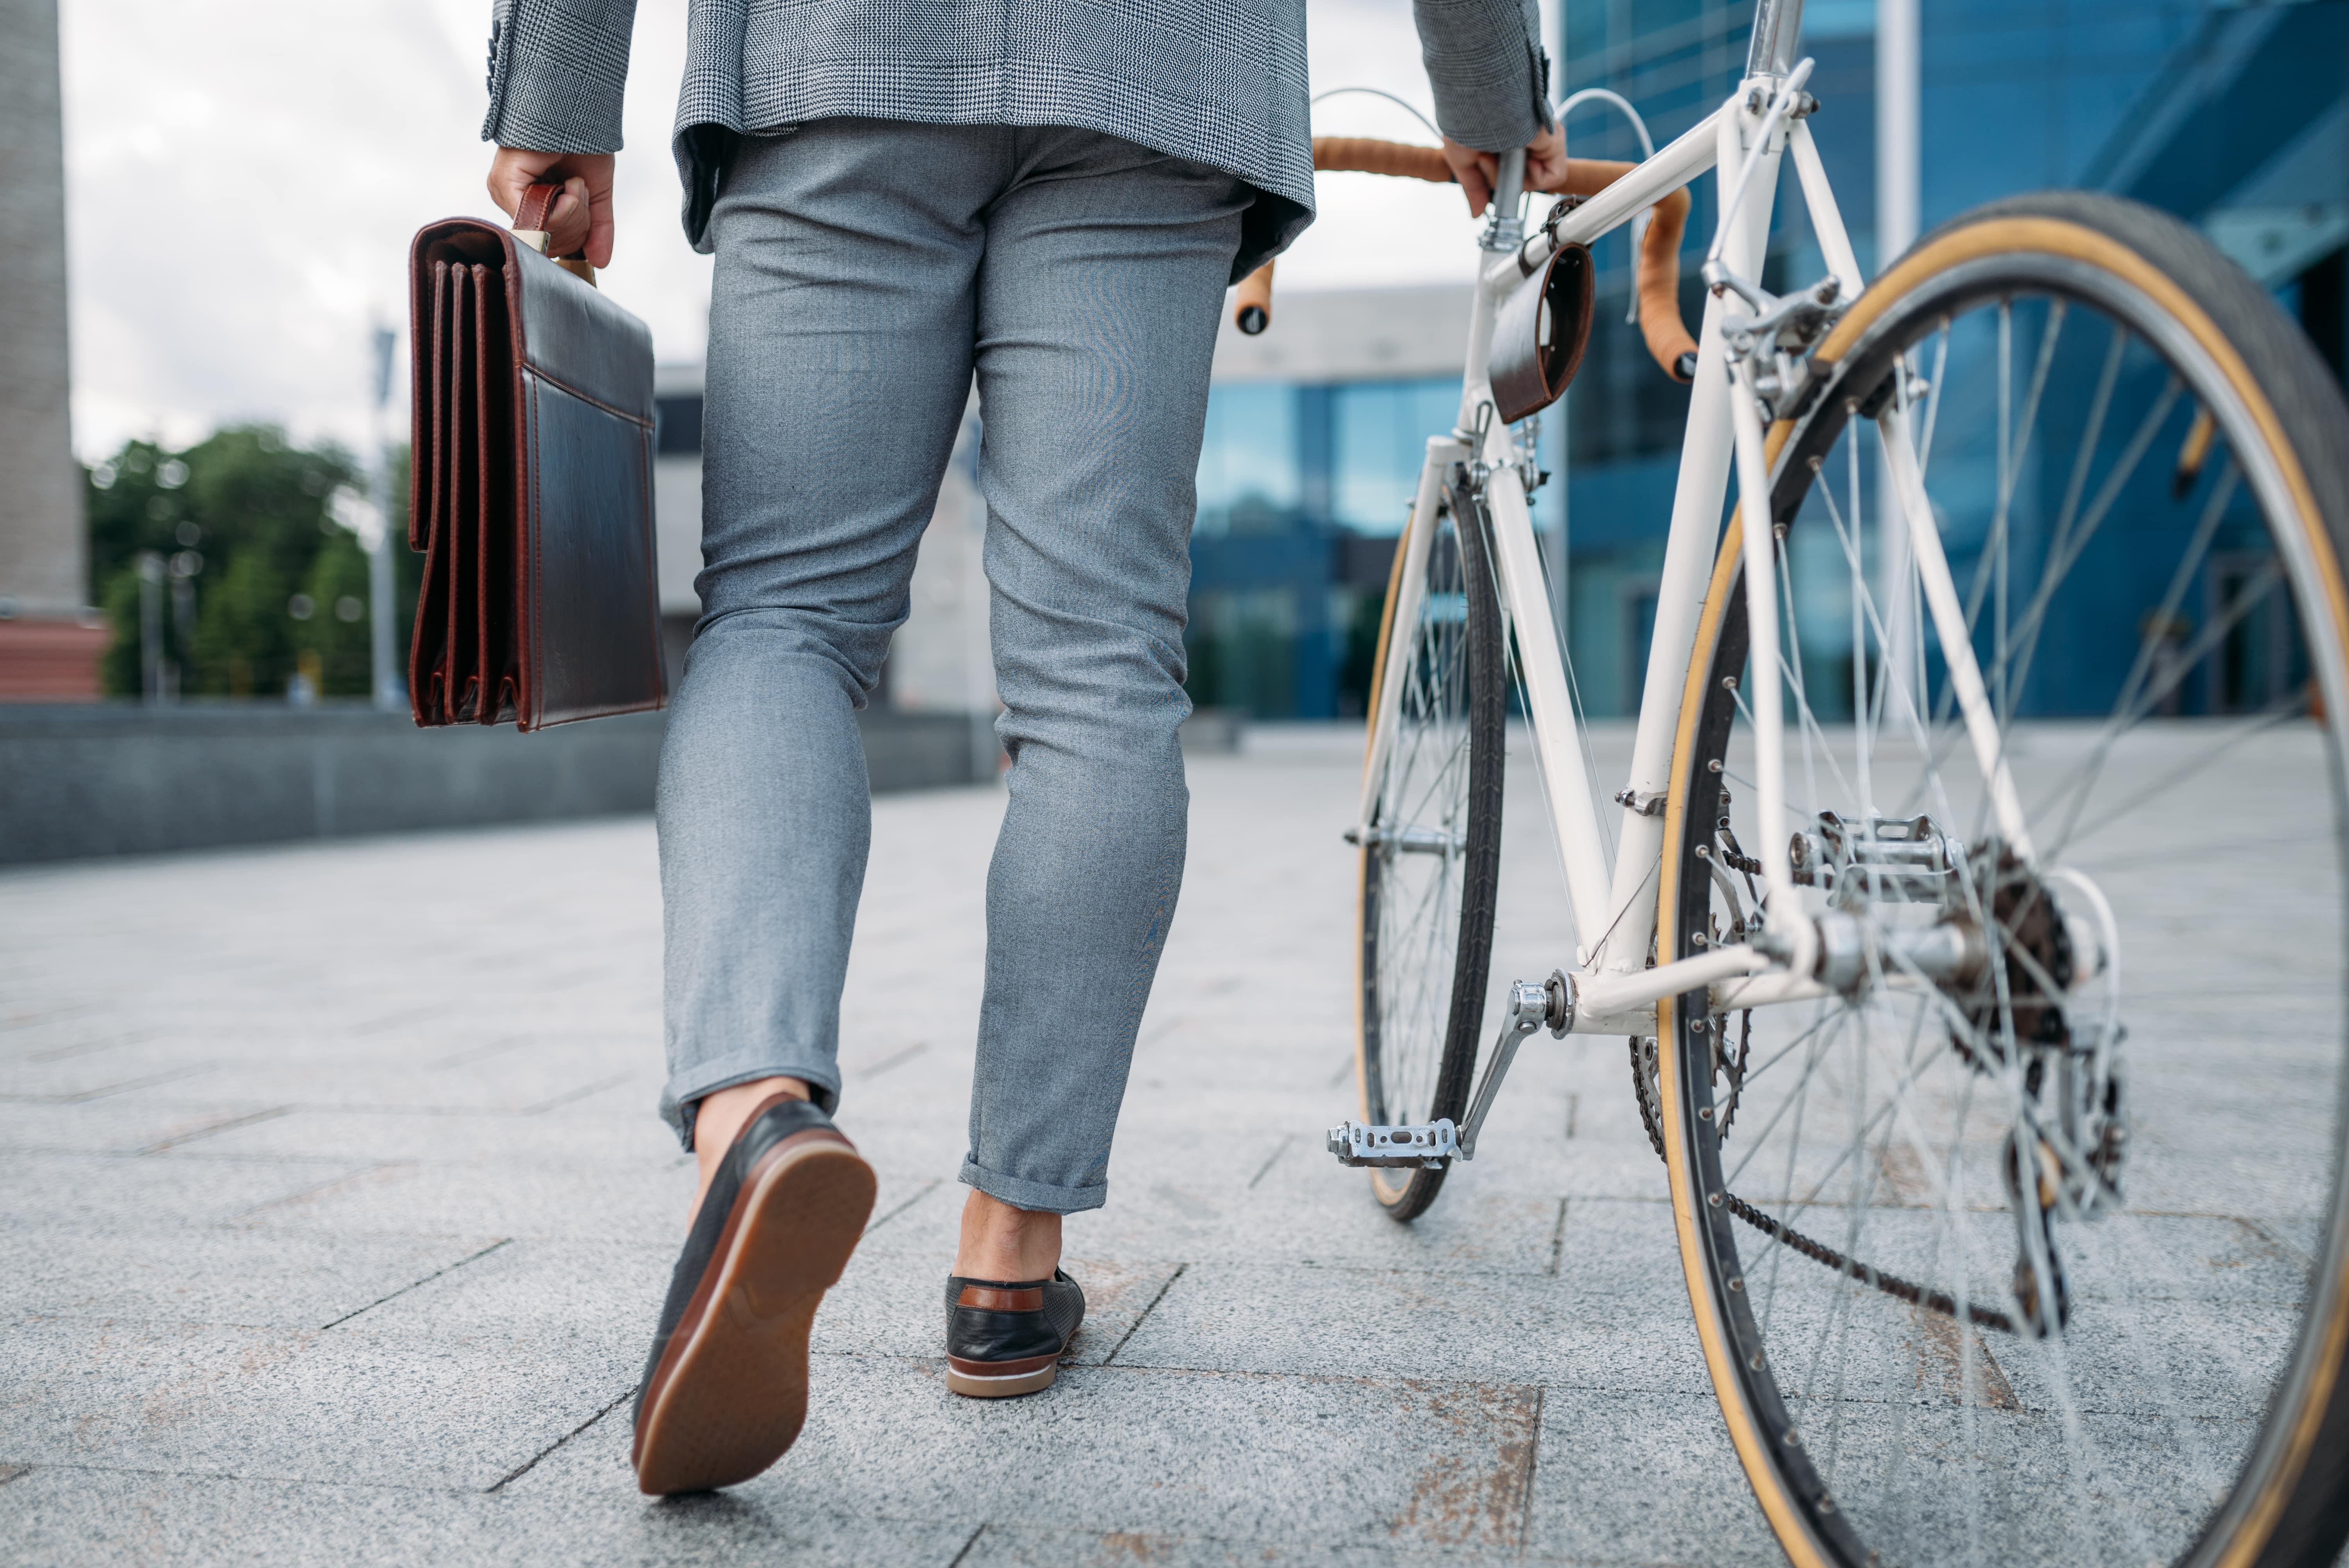 BGM Maßnahme: Fahrrad statt Auto